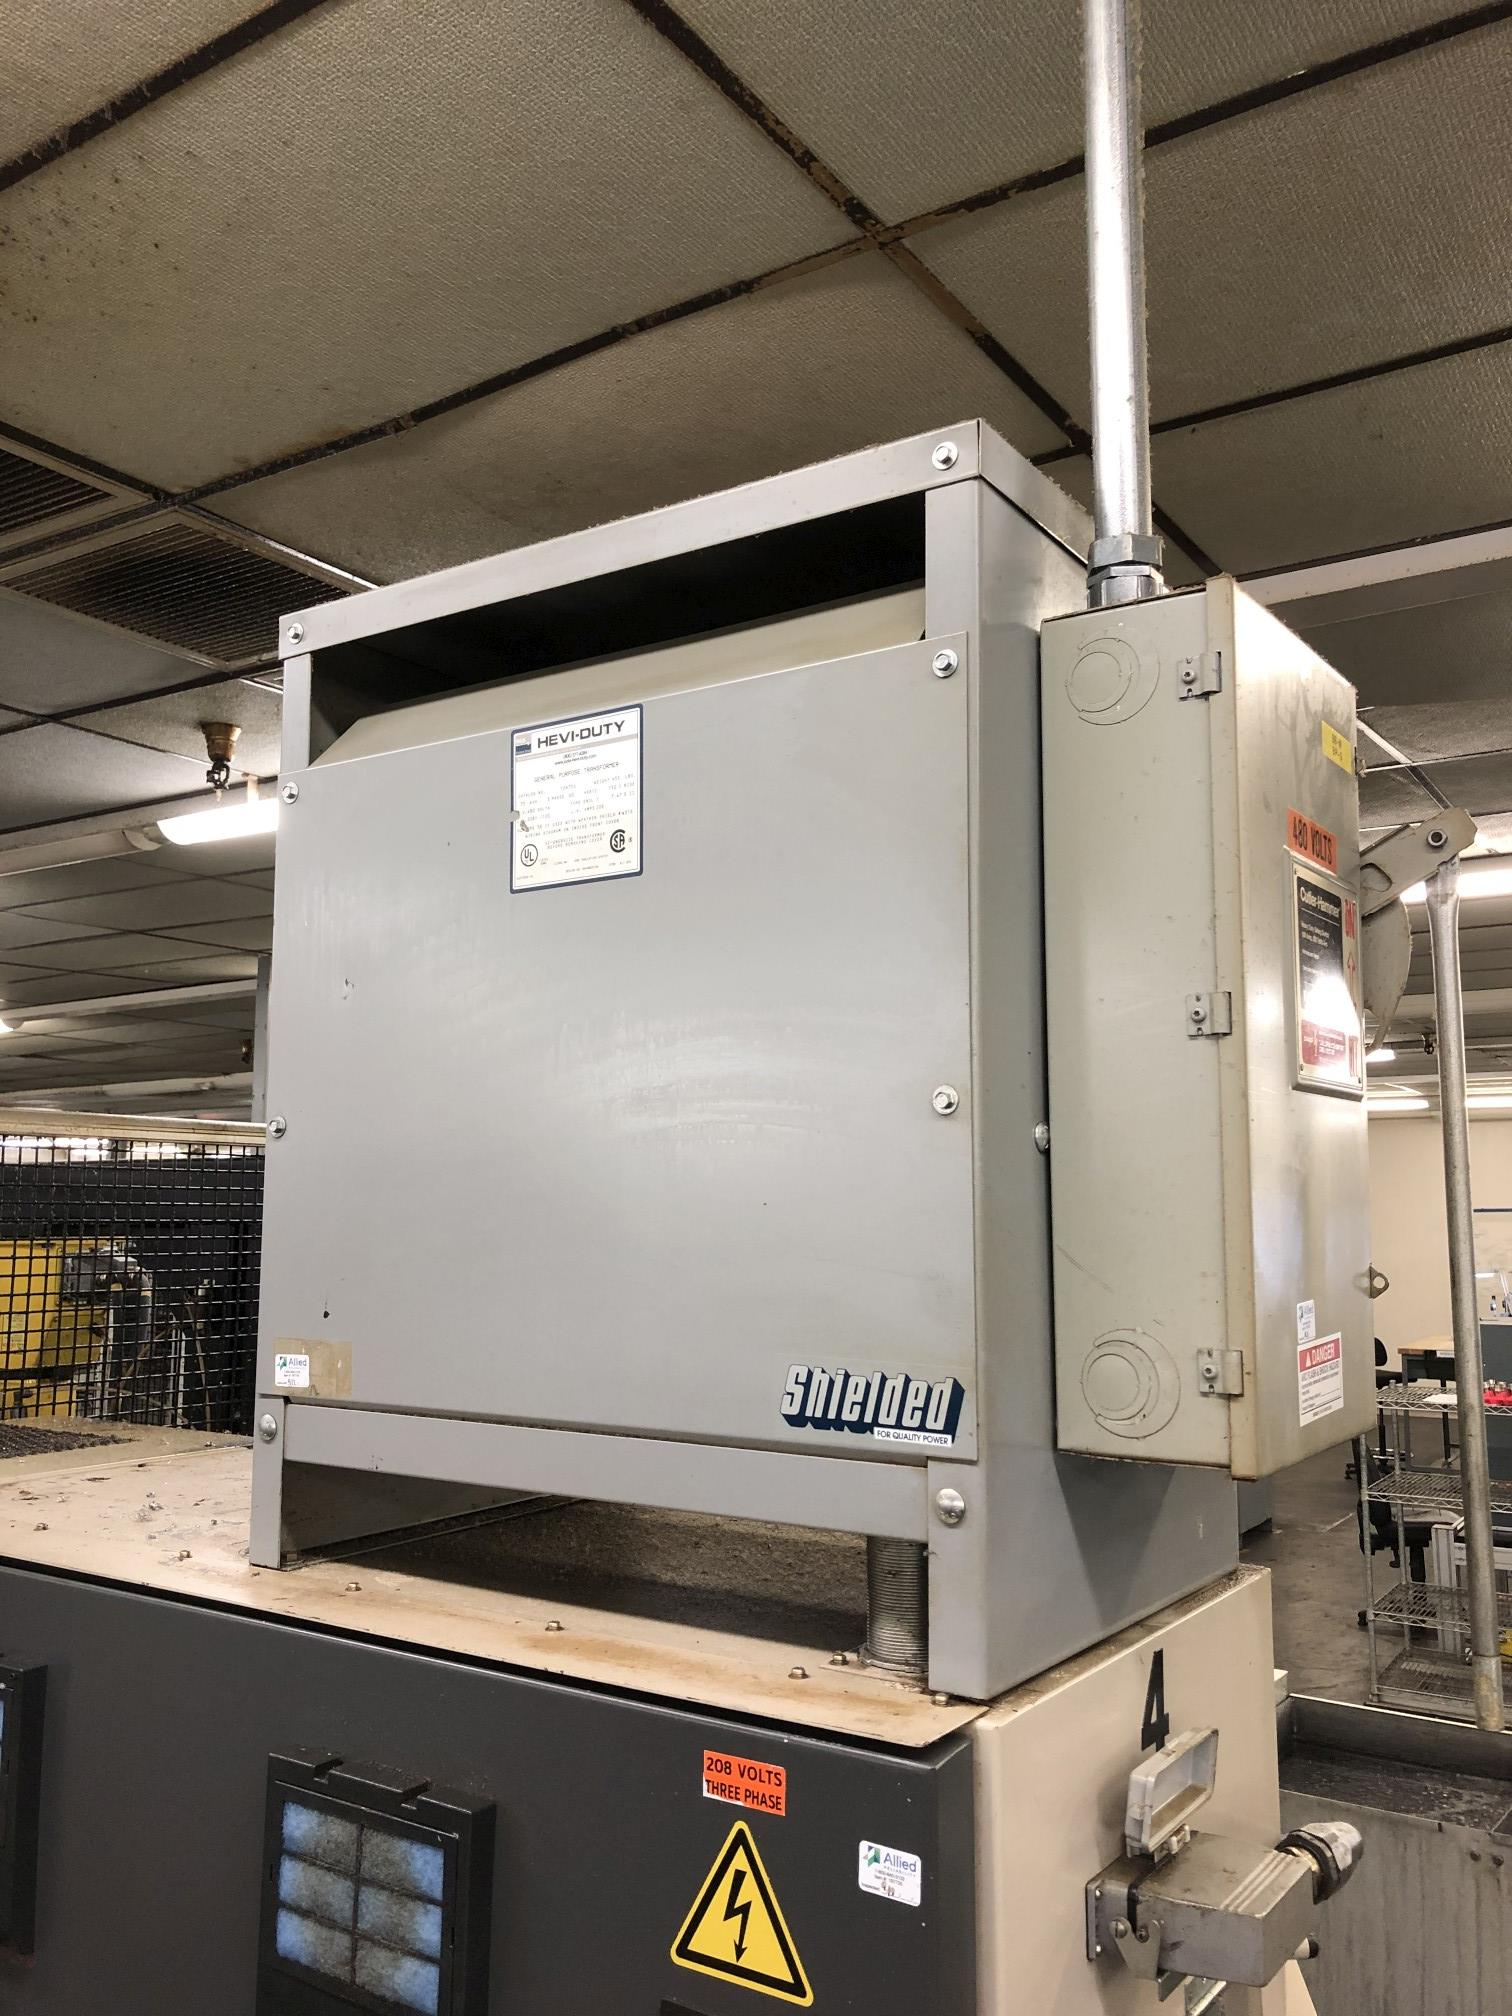 1999 Kitako MT4-200M Multi-Spindle CNC Turning Mill - Image 17 of 19